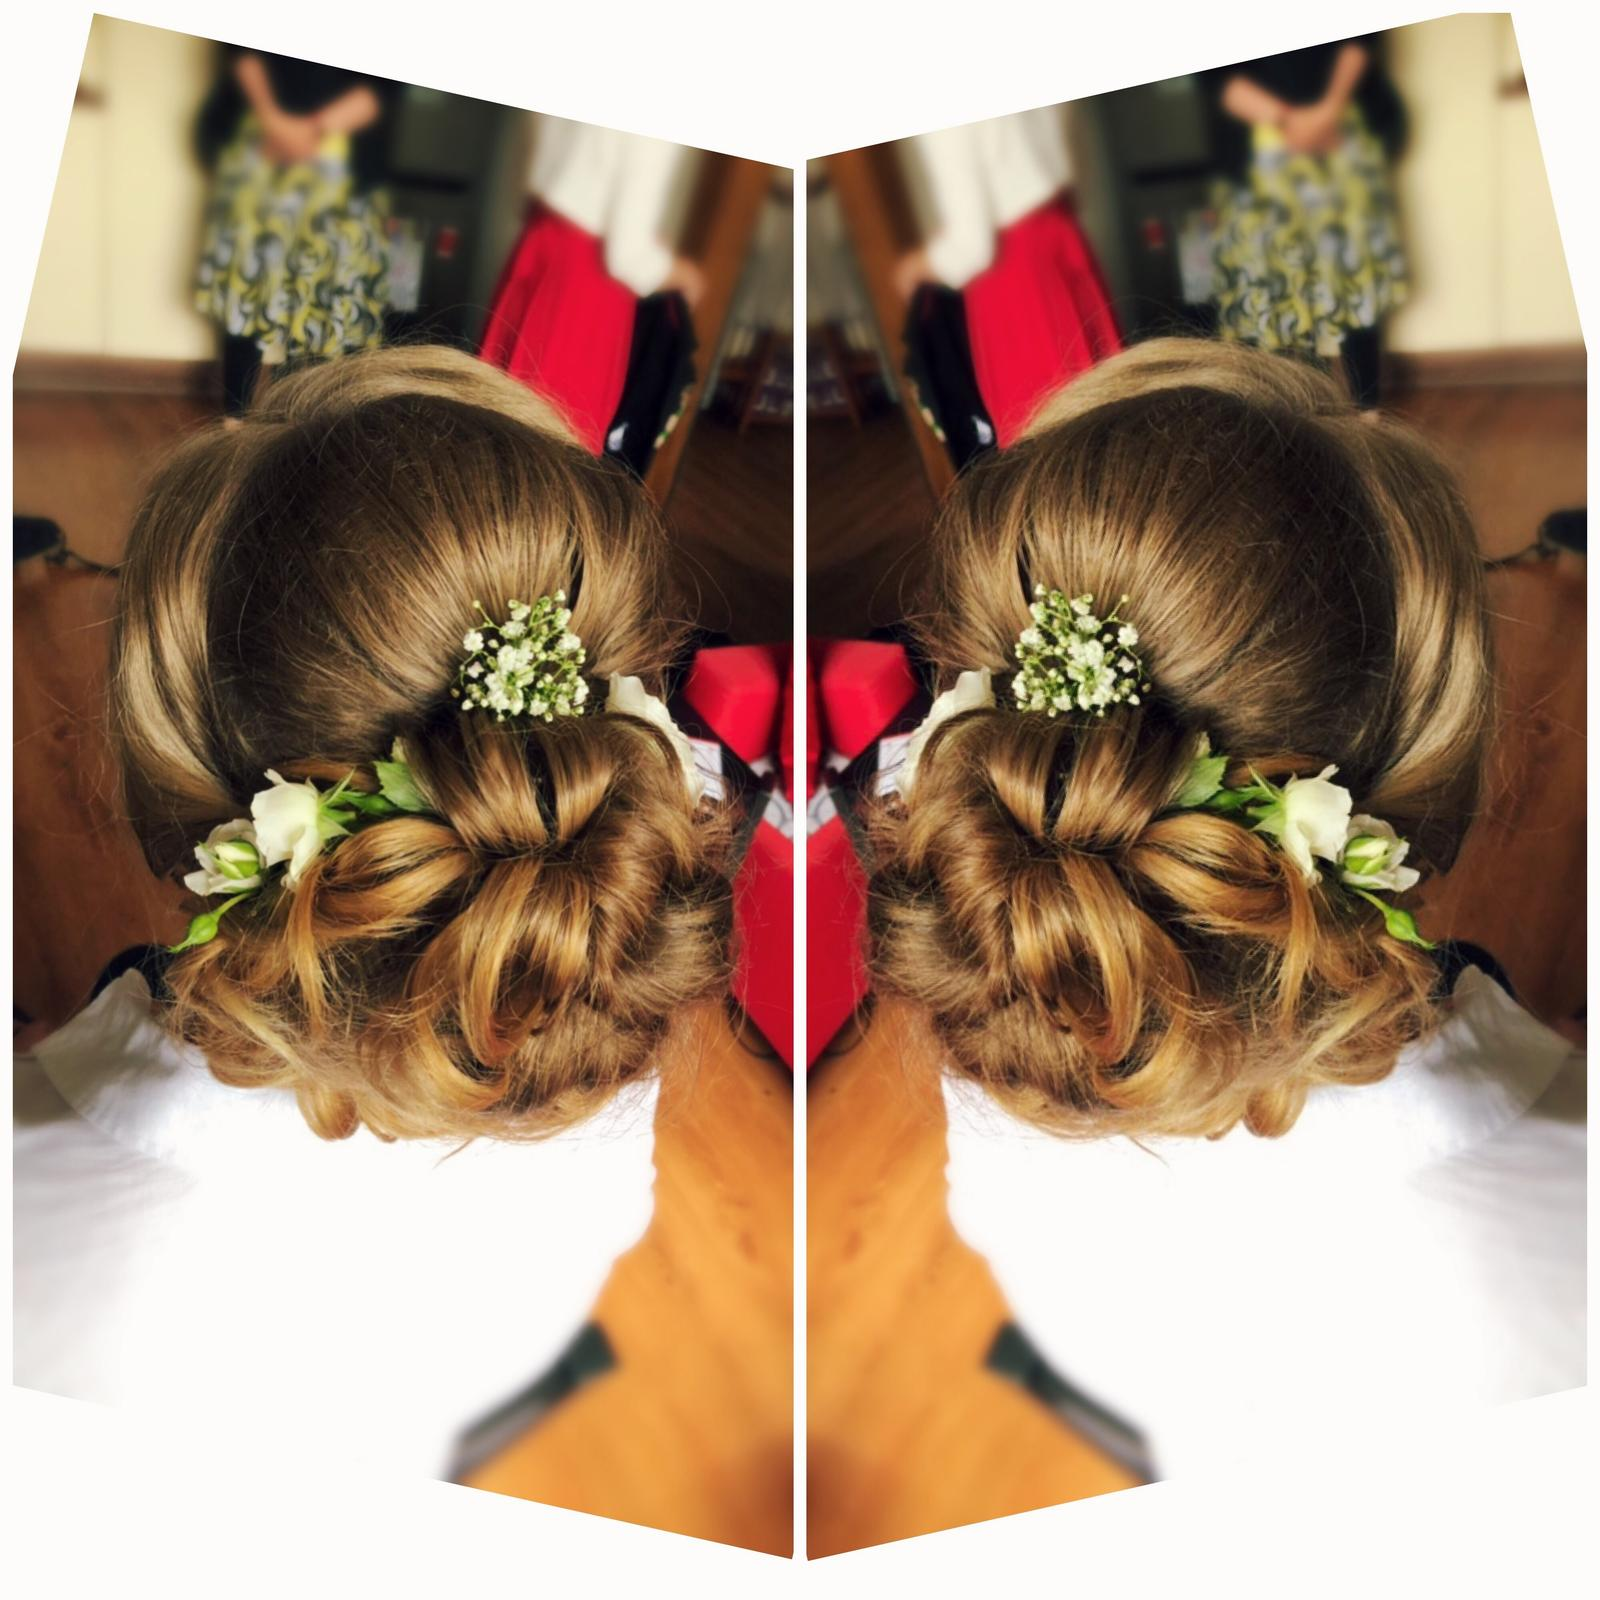 Country hairstyles - Obrázek č. 2